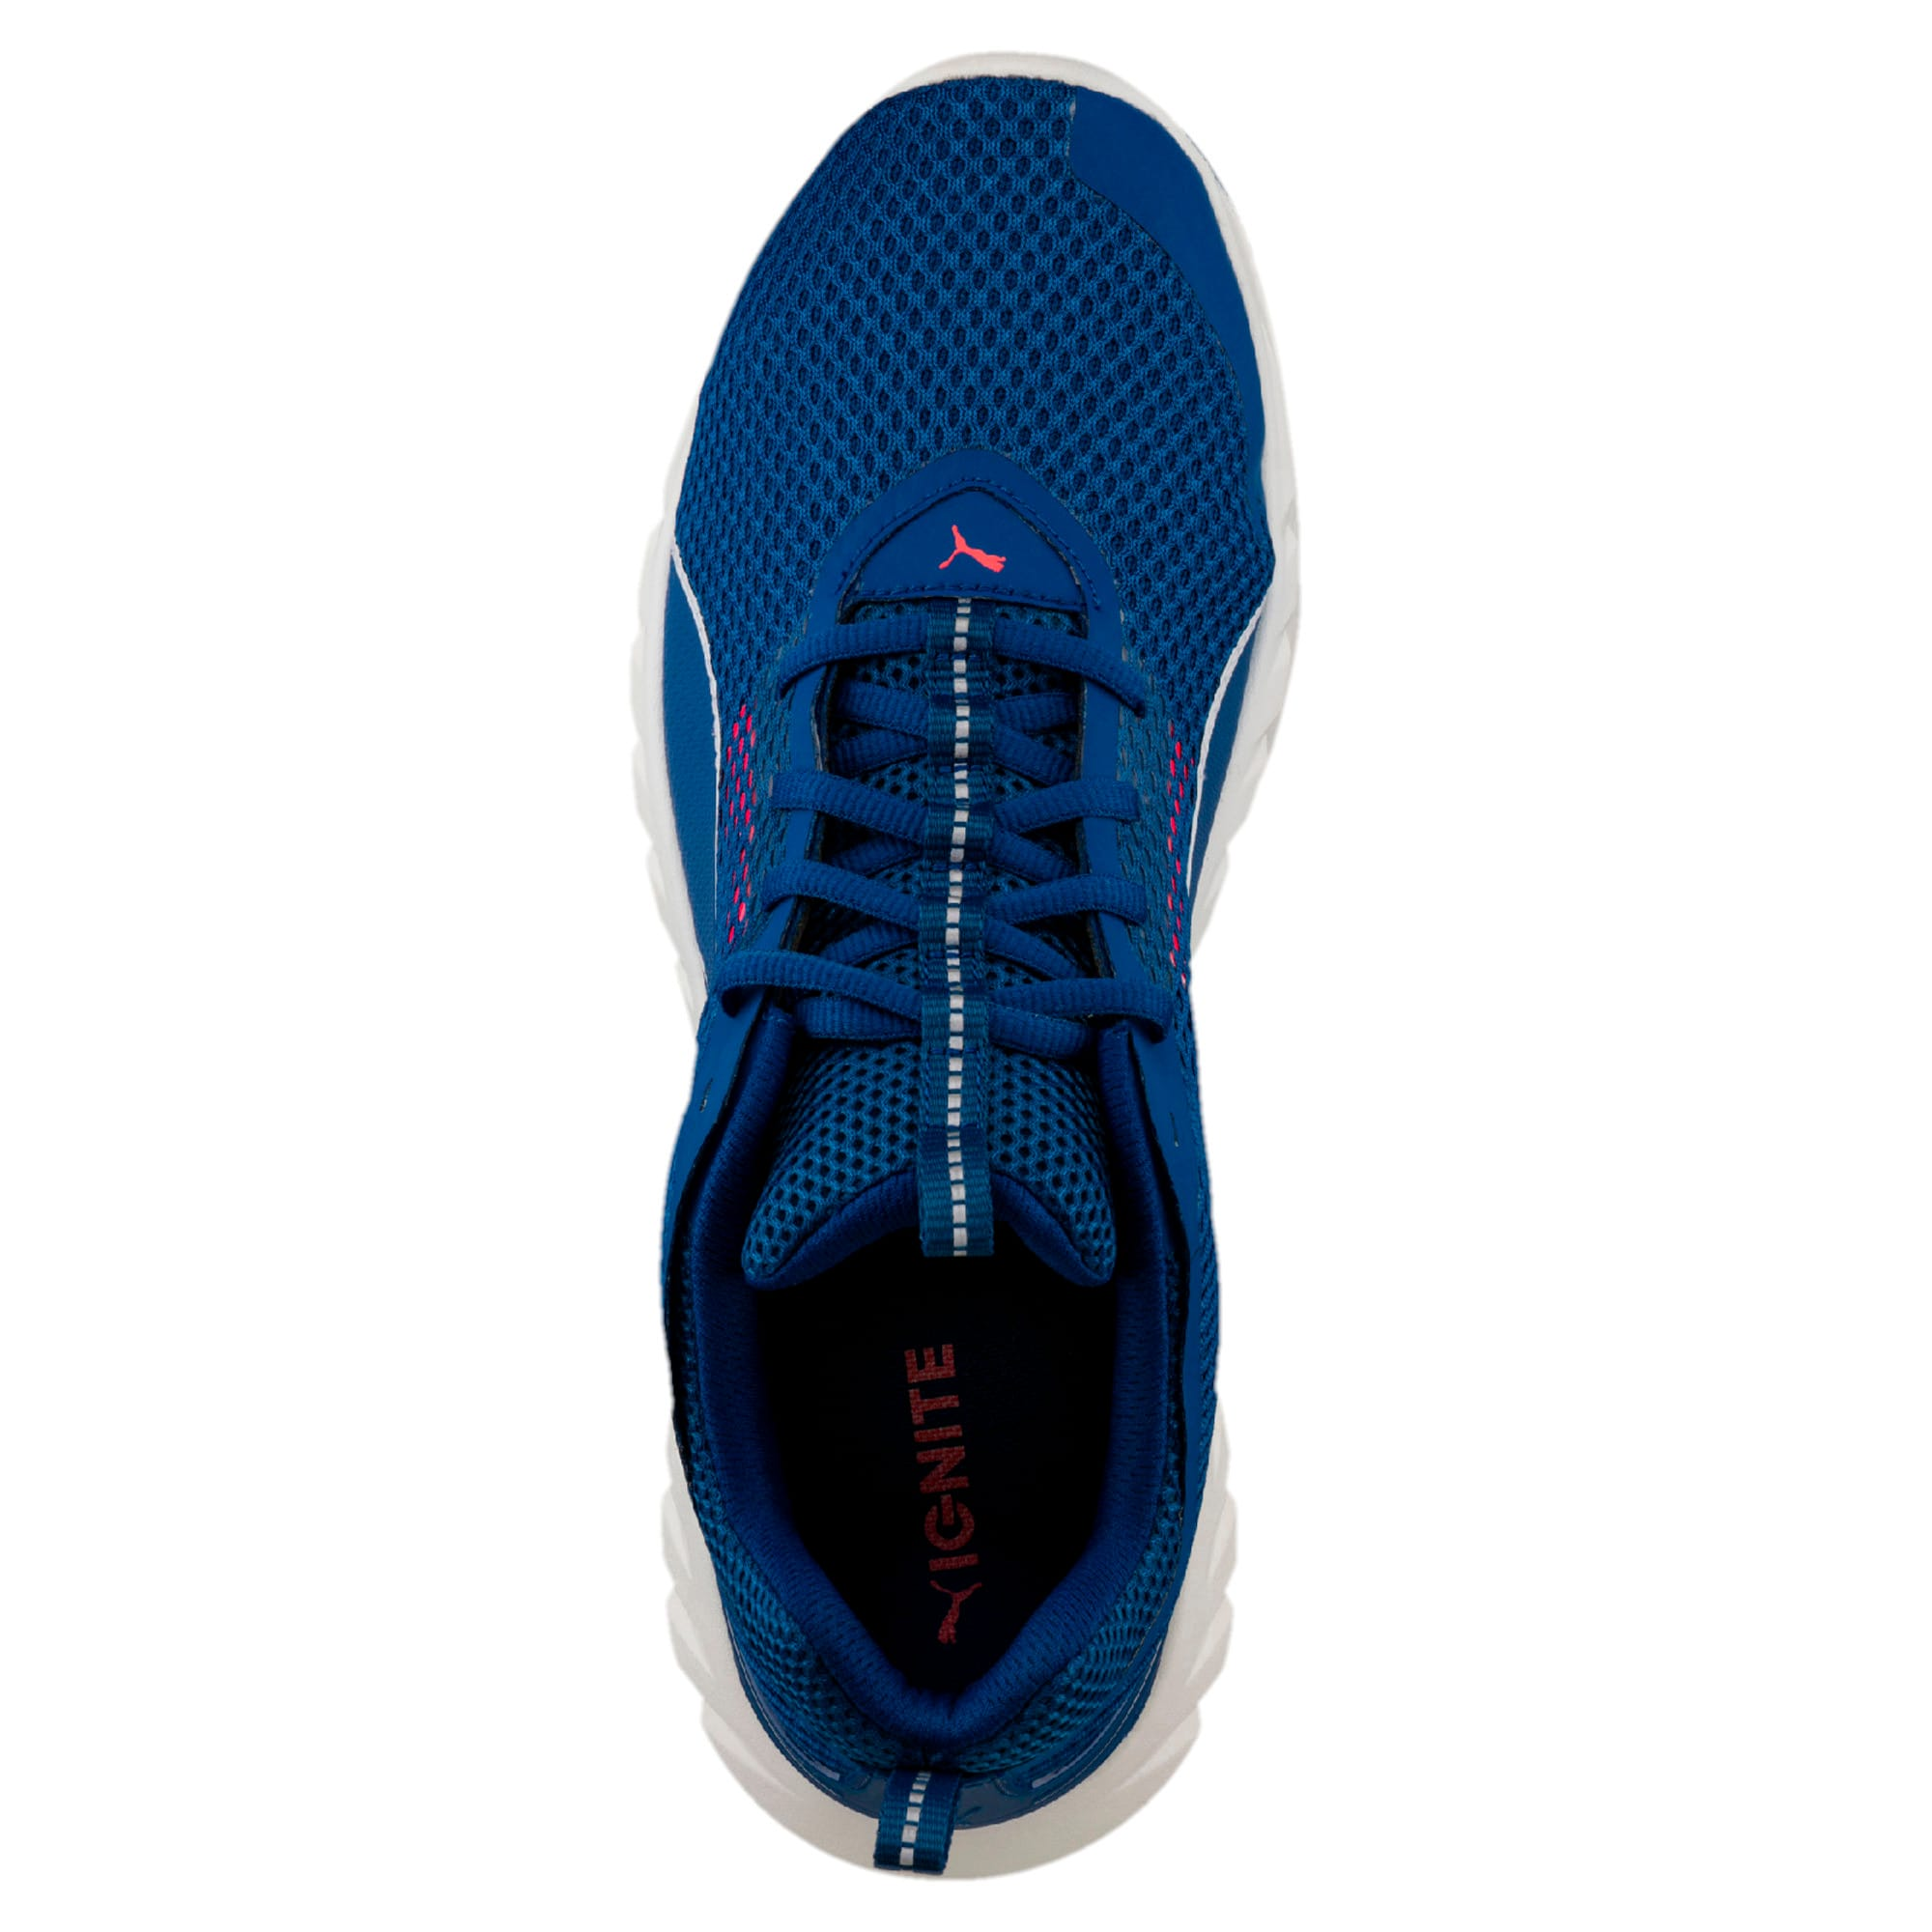 Thumbnail 4 of IGNITE Ultimate 2 Men's Running Shoes, TRUE BLUE-Bright Plasma, medium-IND